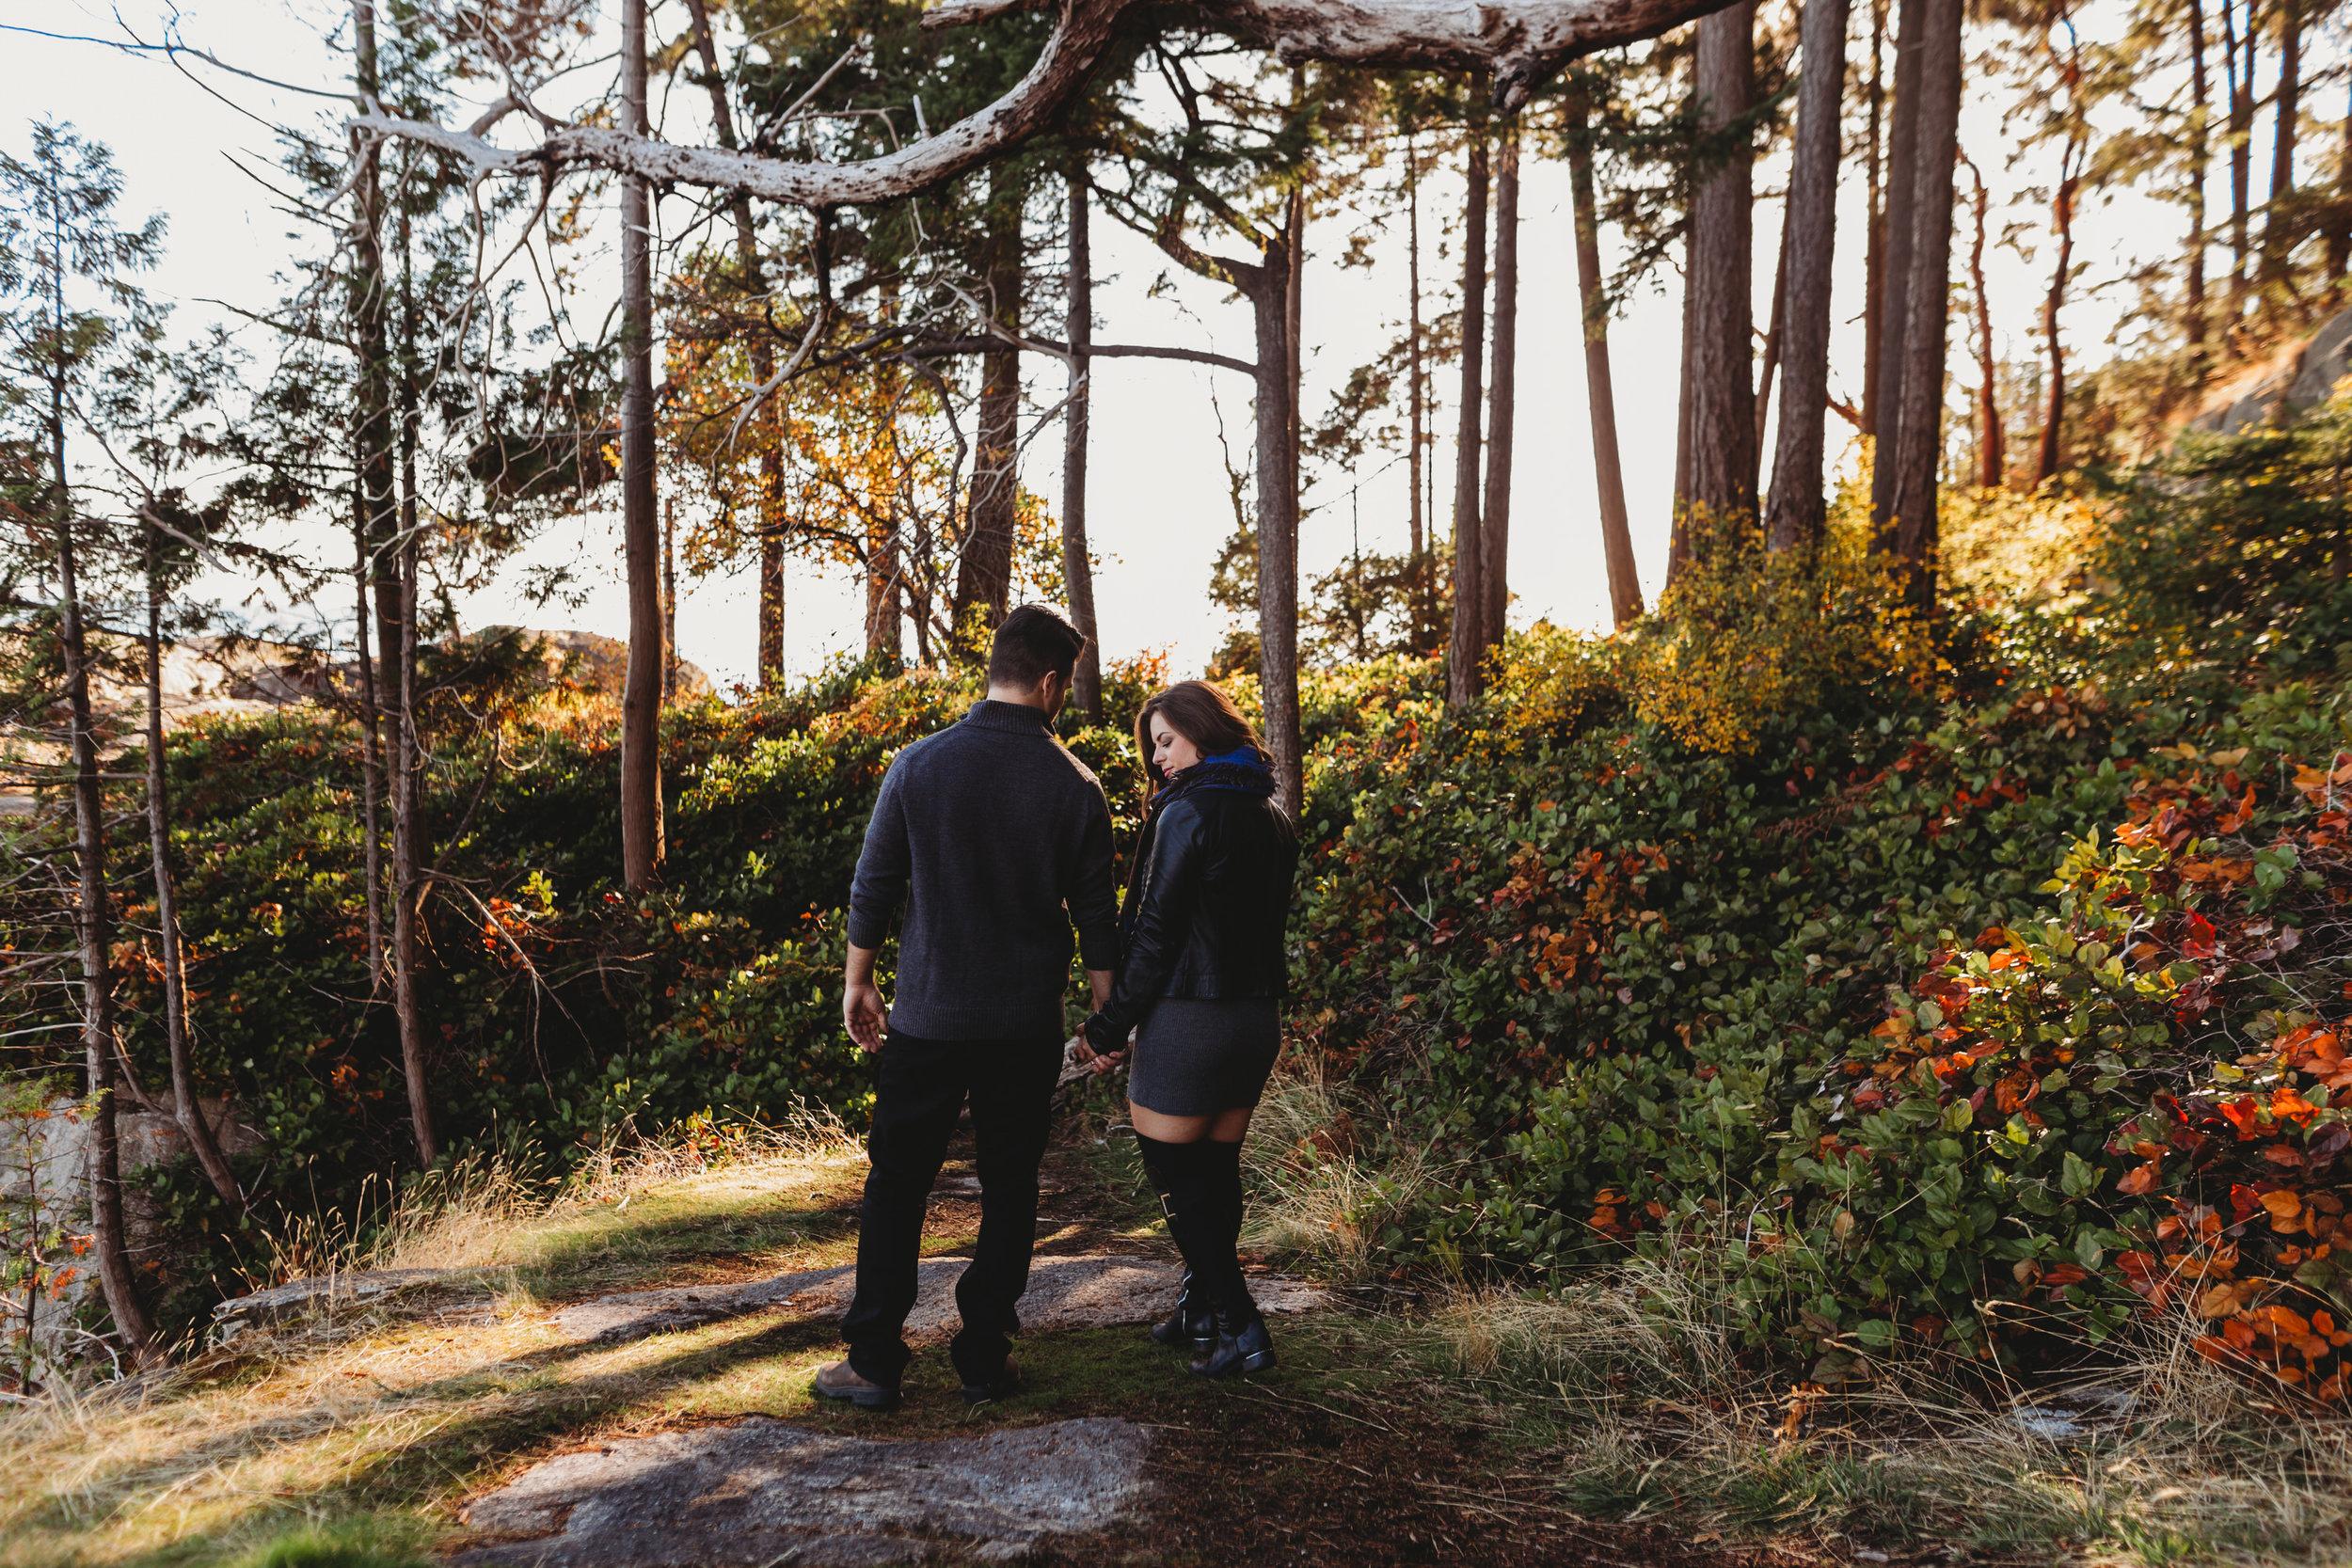 Lighthouse Park Engagement Photos - Vancouver Wedding Photographer & Videographer - Sunshine Coast Wedding Photos - Sunshine Coast Wedding Photographer - Jennifer Picard Photography - IMG_5874.jpg